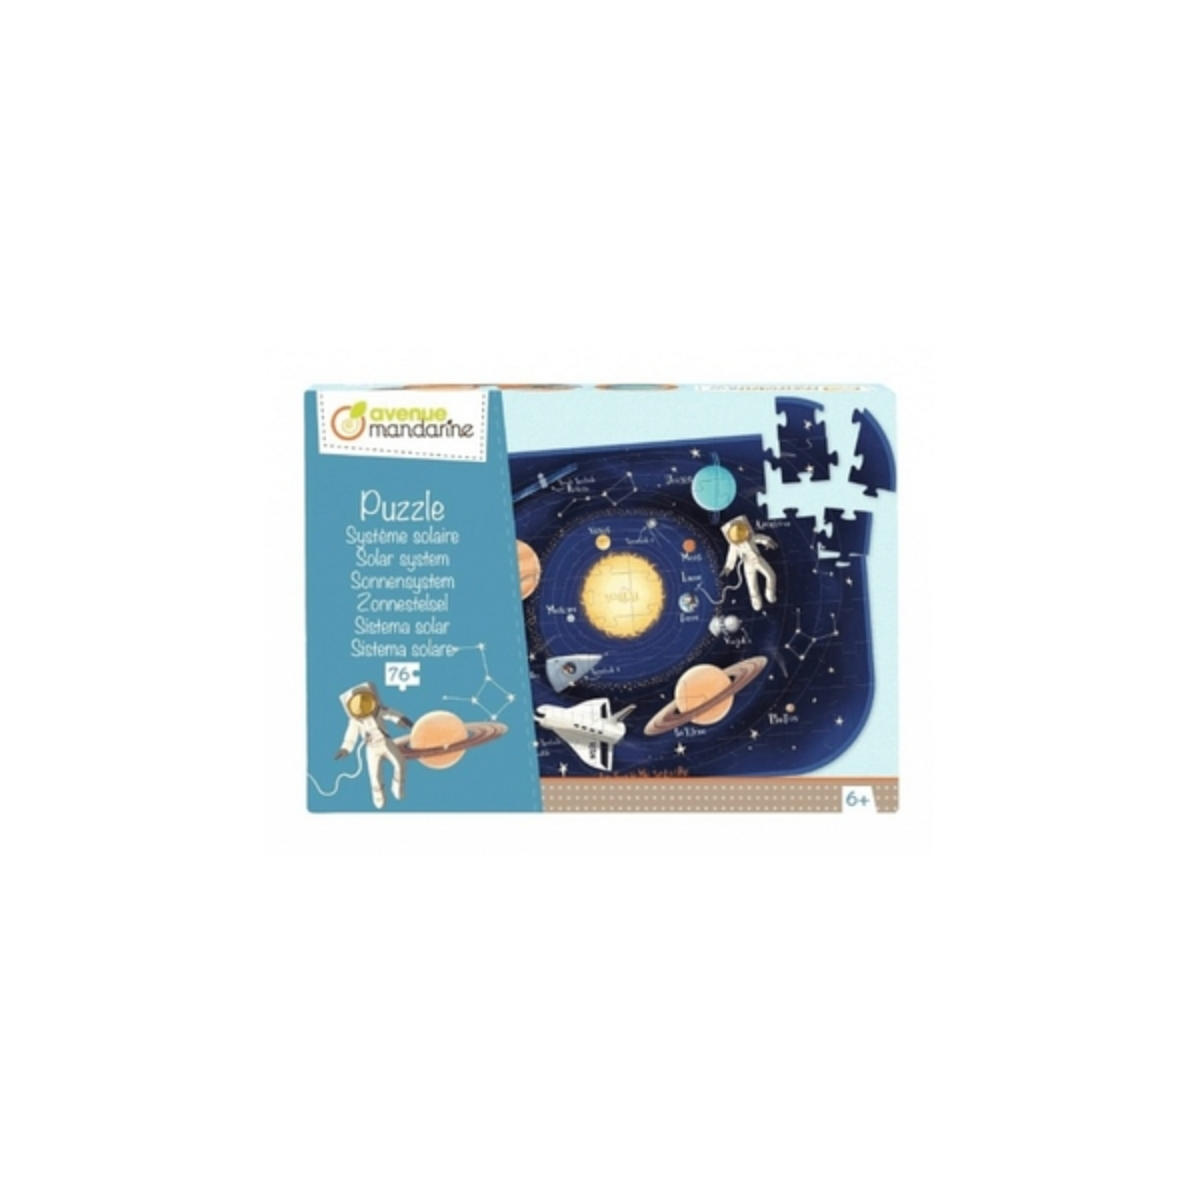 Avenue Mandarine - Puzzle Systeme solaire 76 p